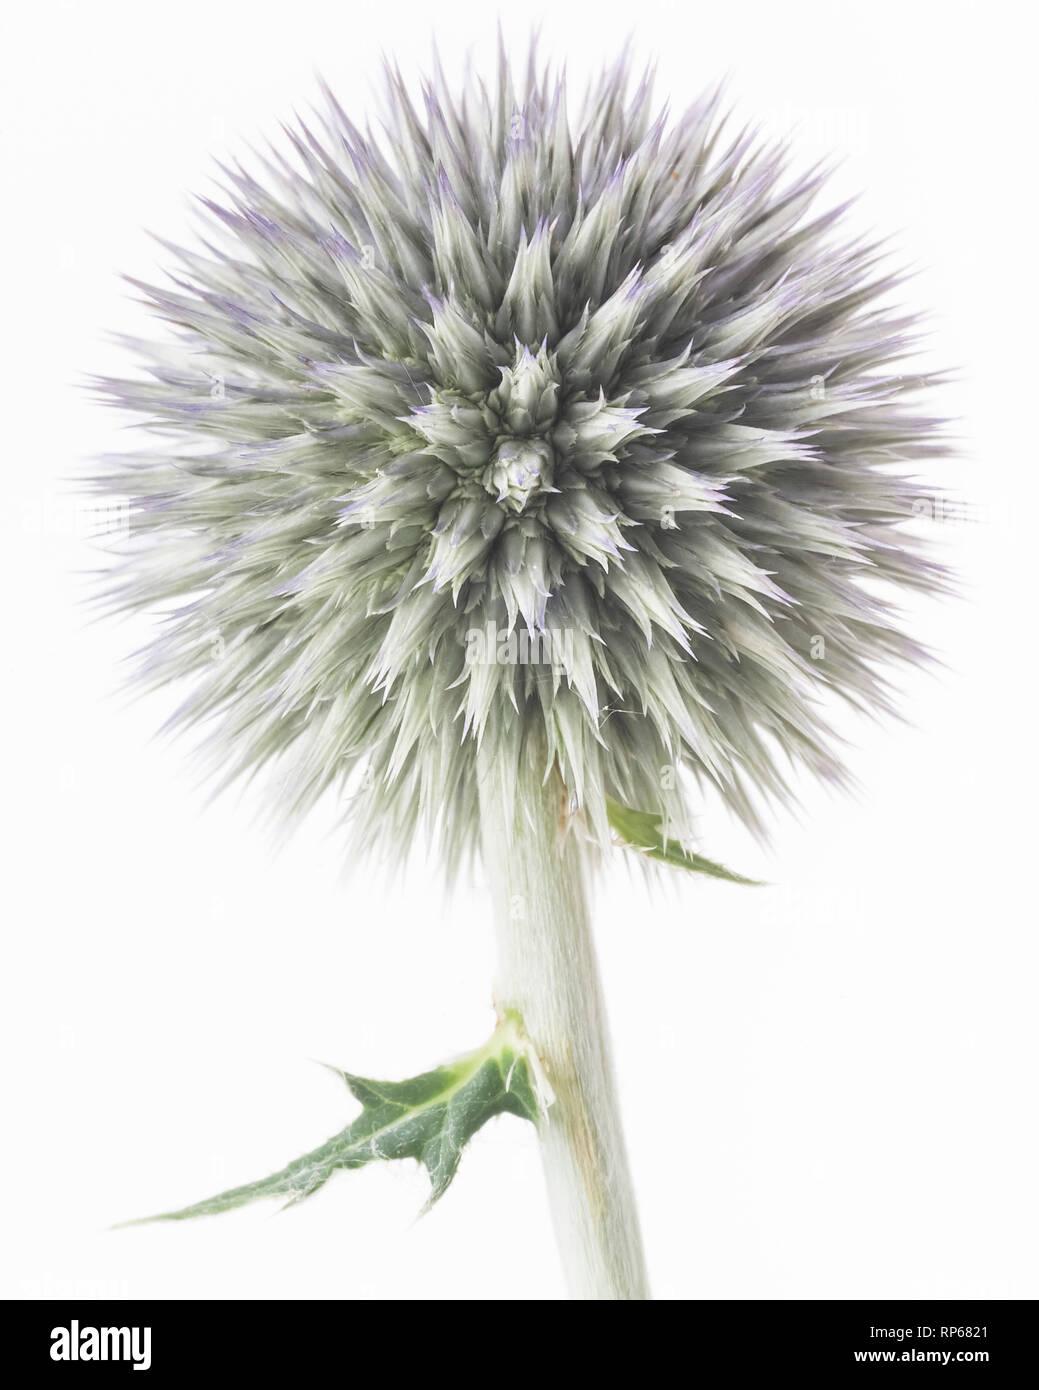 Globe Thistle, Echinops ritro, Pre-Bloom against White Background - Stock Image